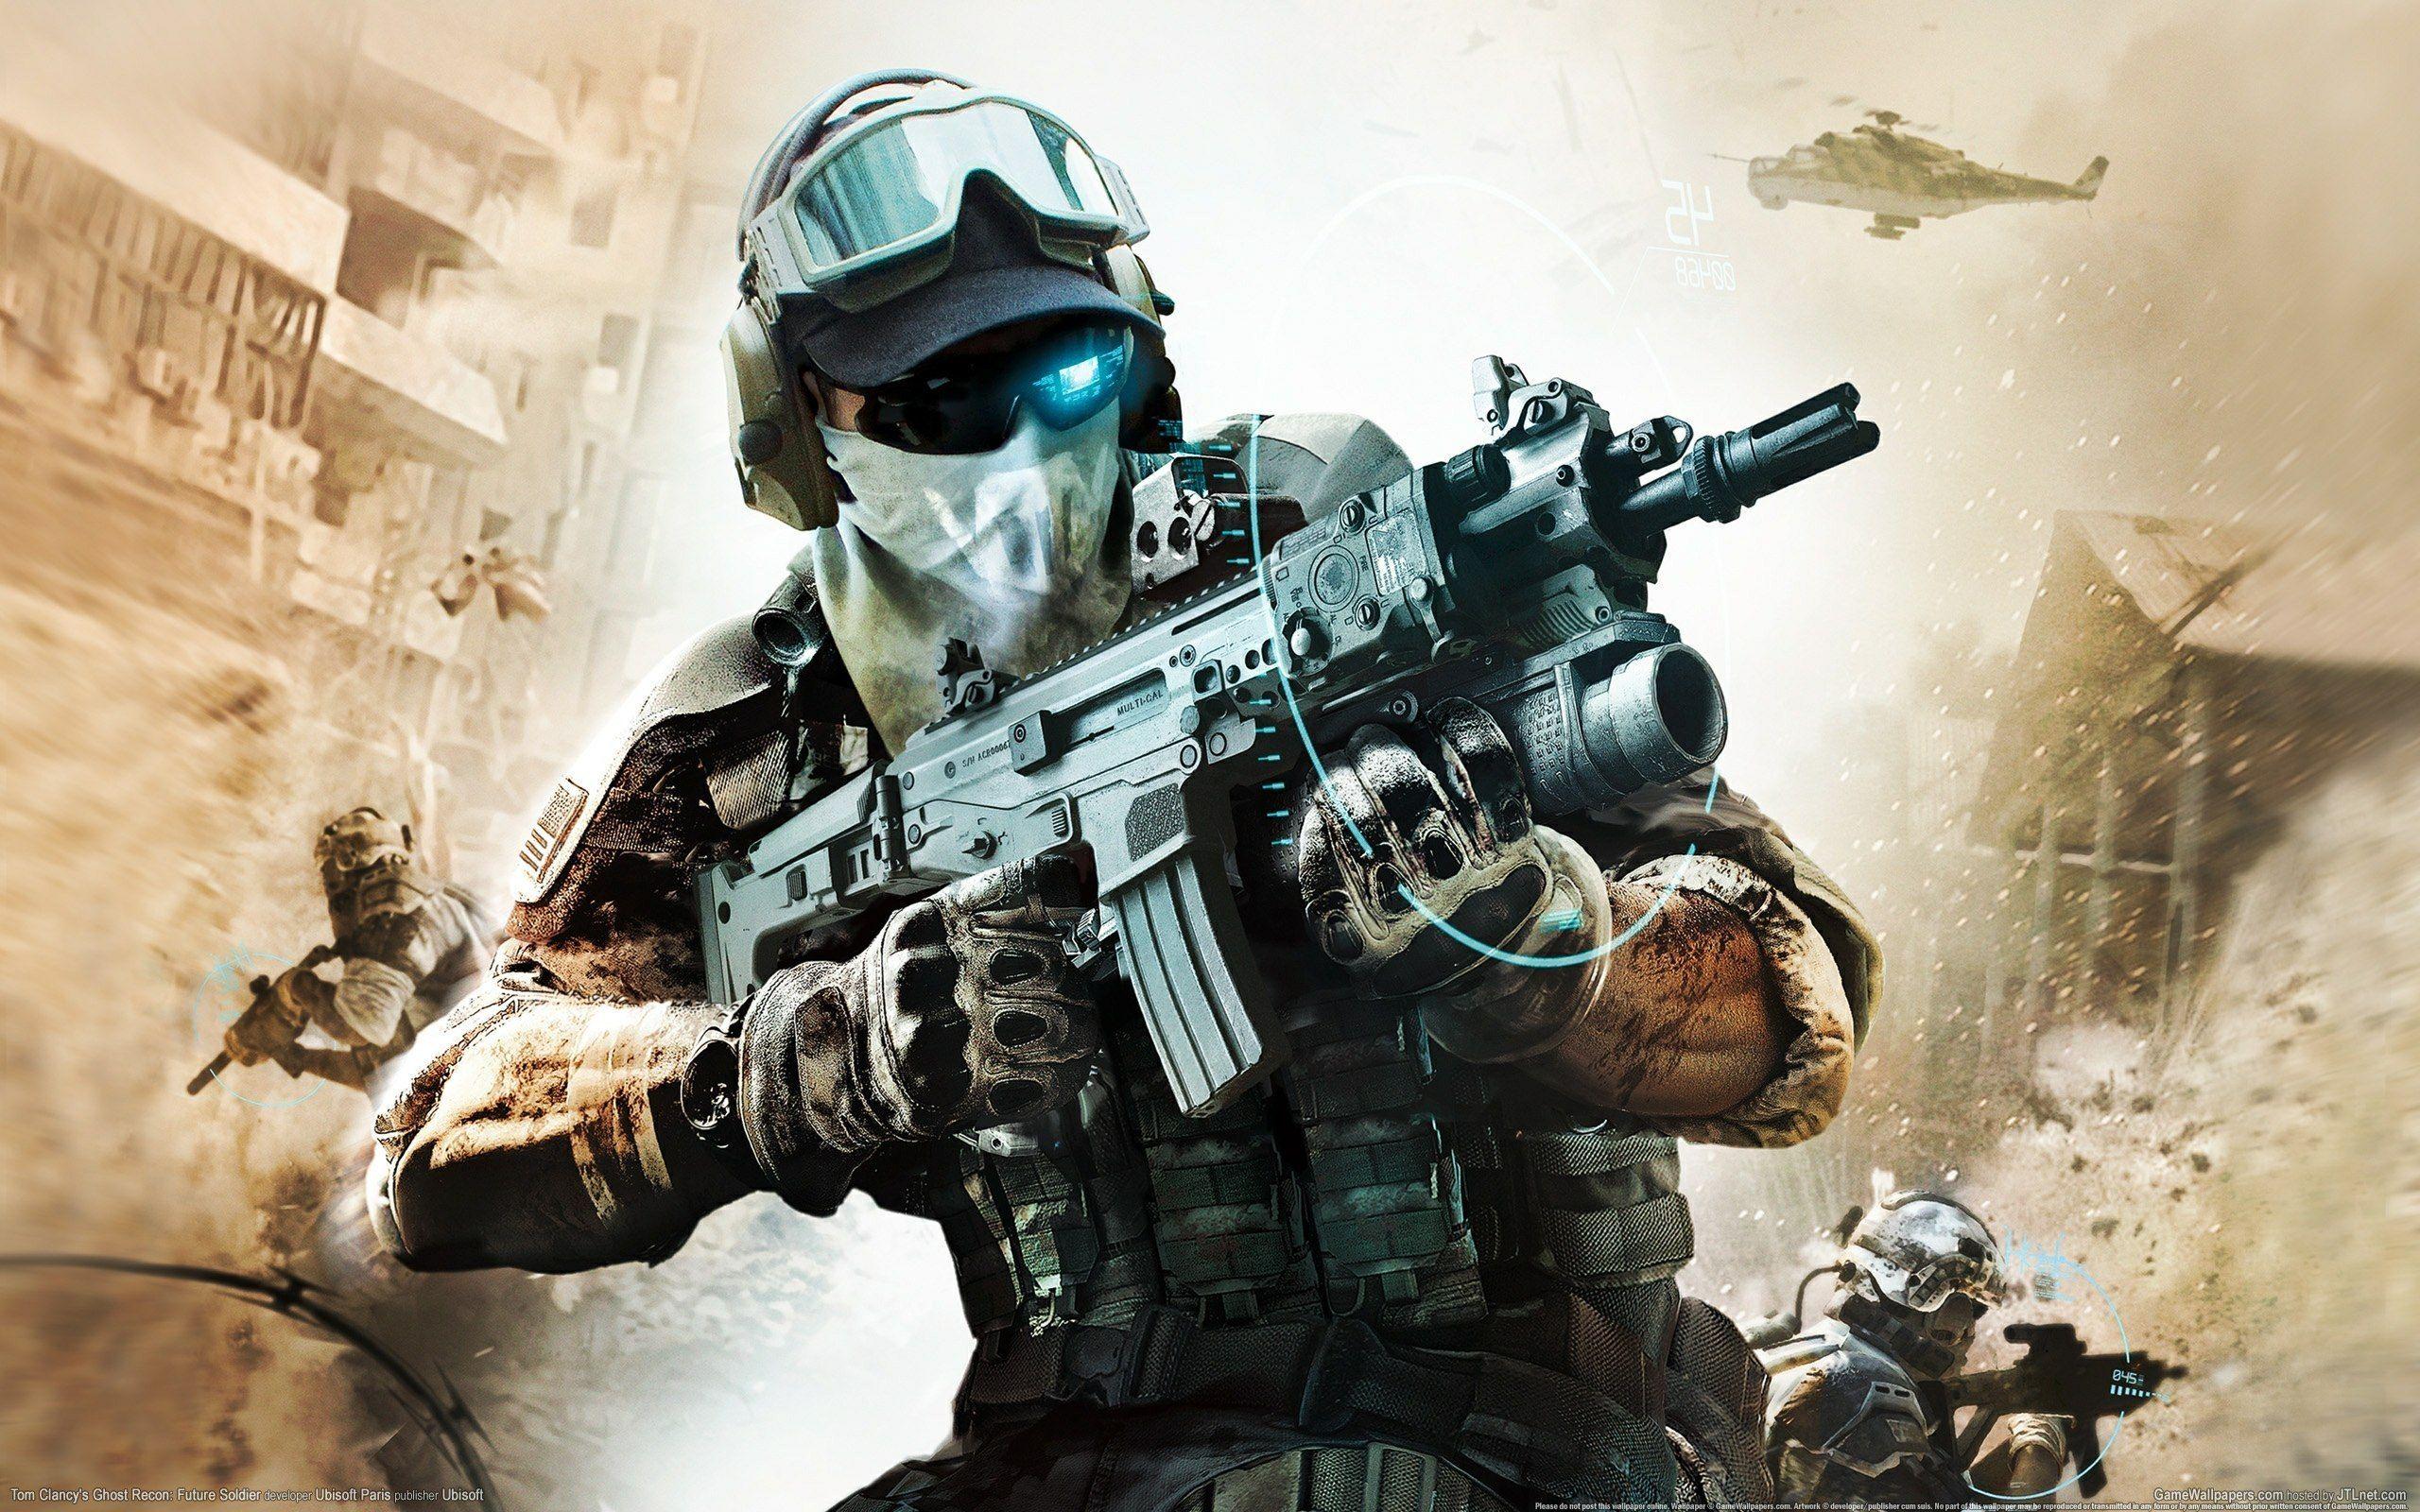 ghost recon future soldier - Google Search | zombie gear ...